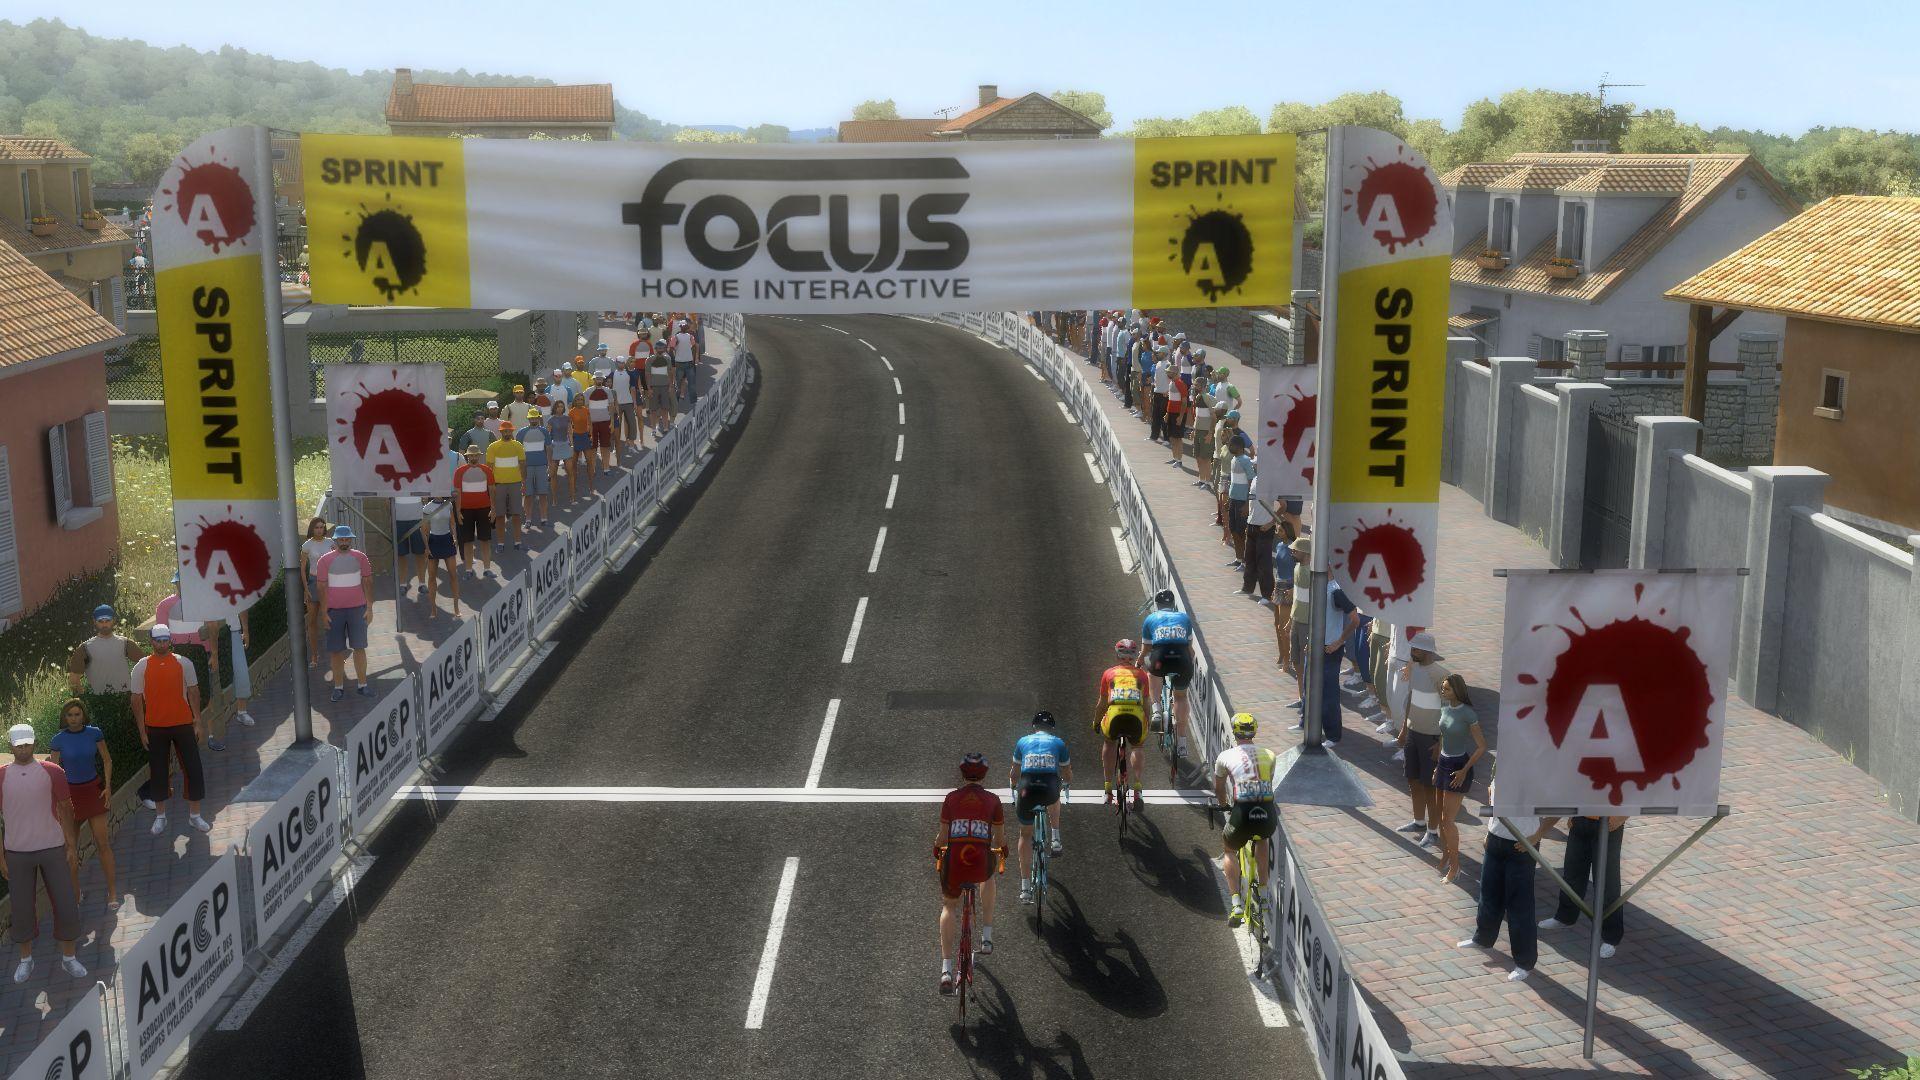 pcmdaily.com/images/mg/2019/Races/PT/Tirreno/mg19_ta_s07_12.jpg